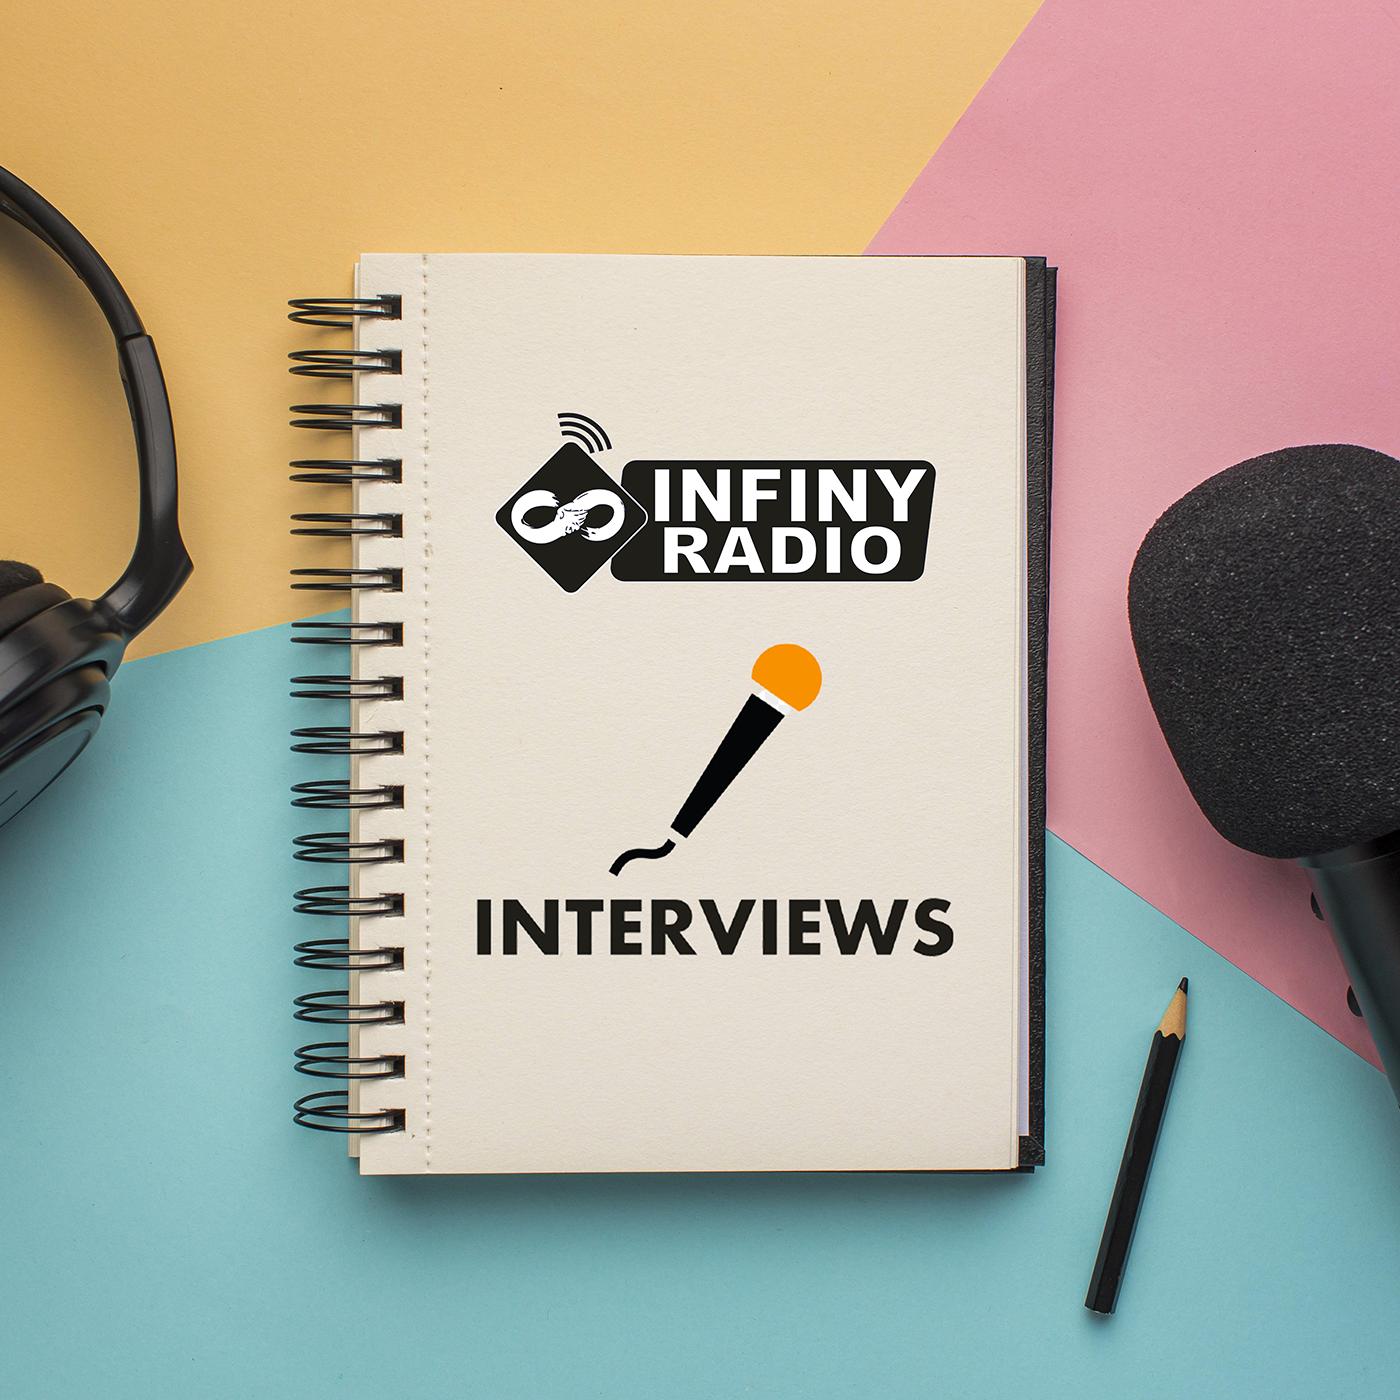 Les Interviews d'Infiny Radio